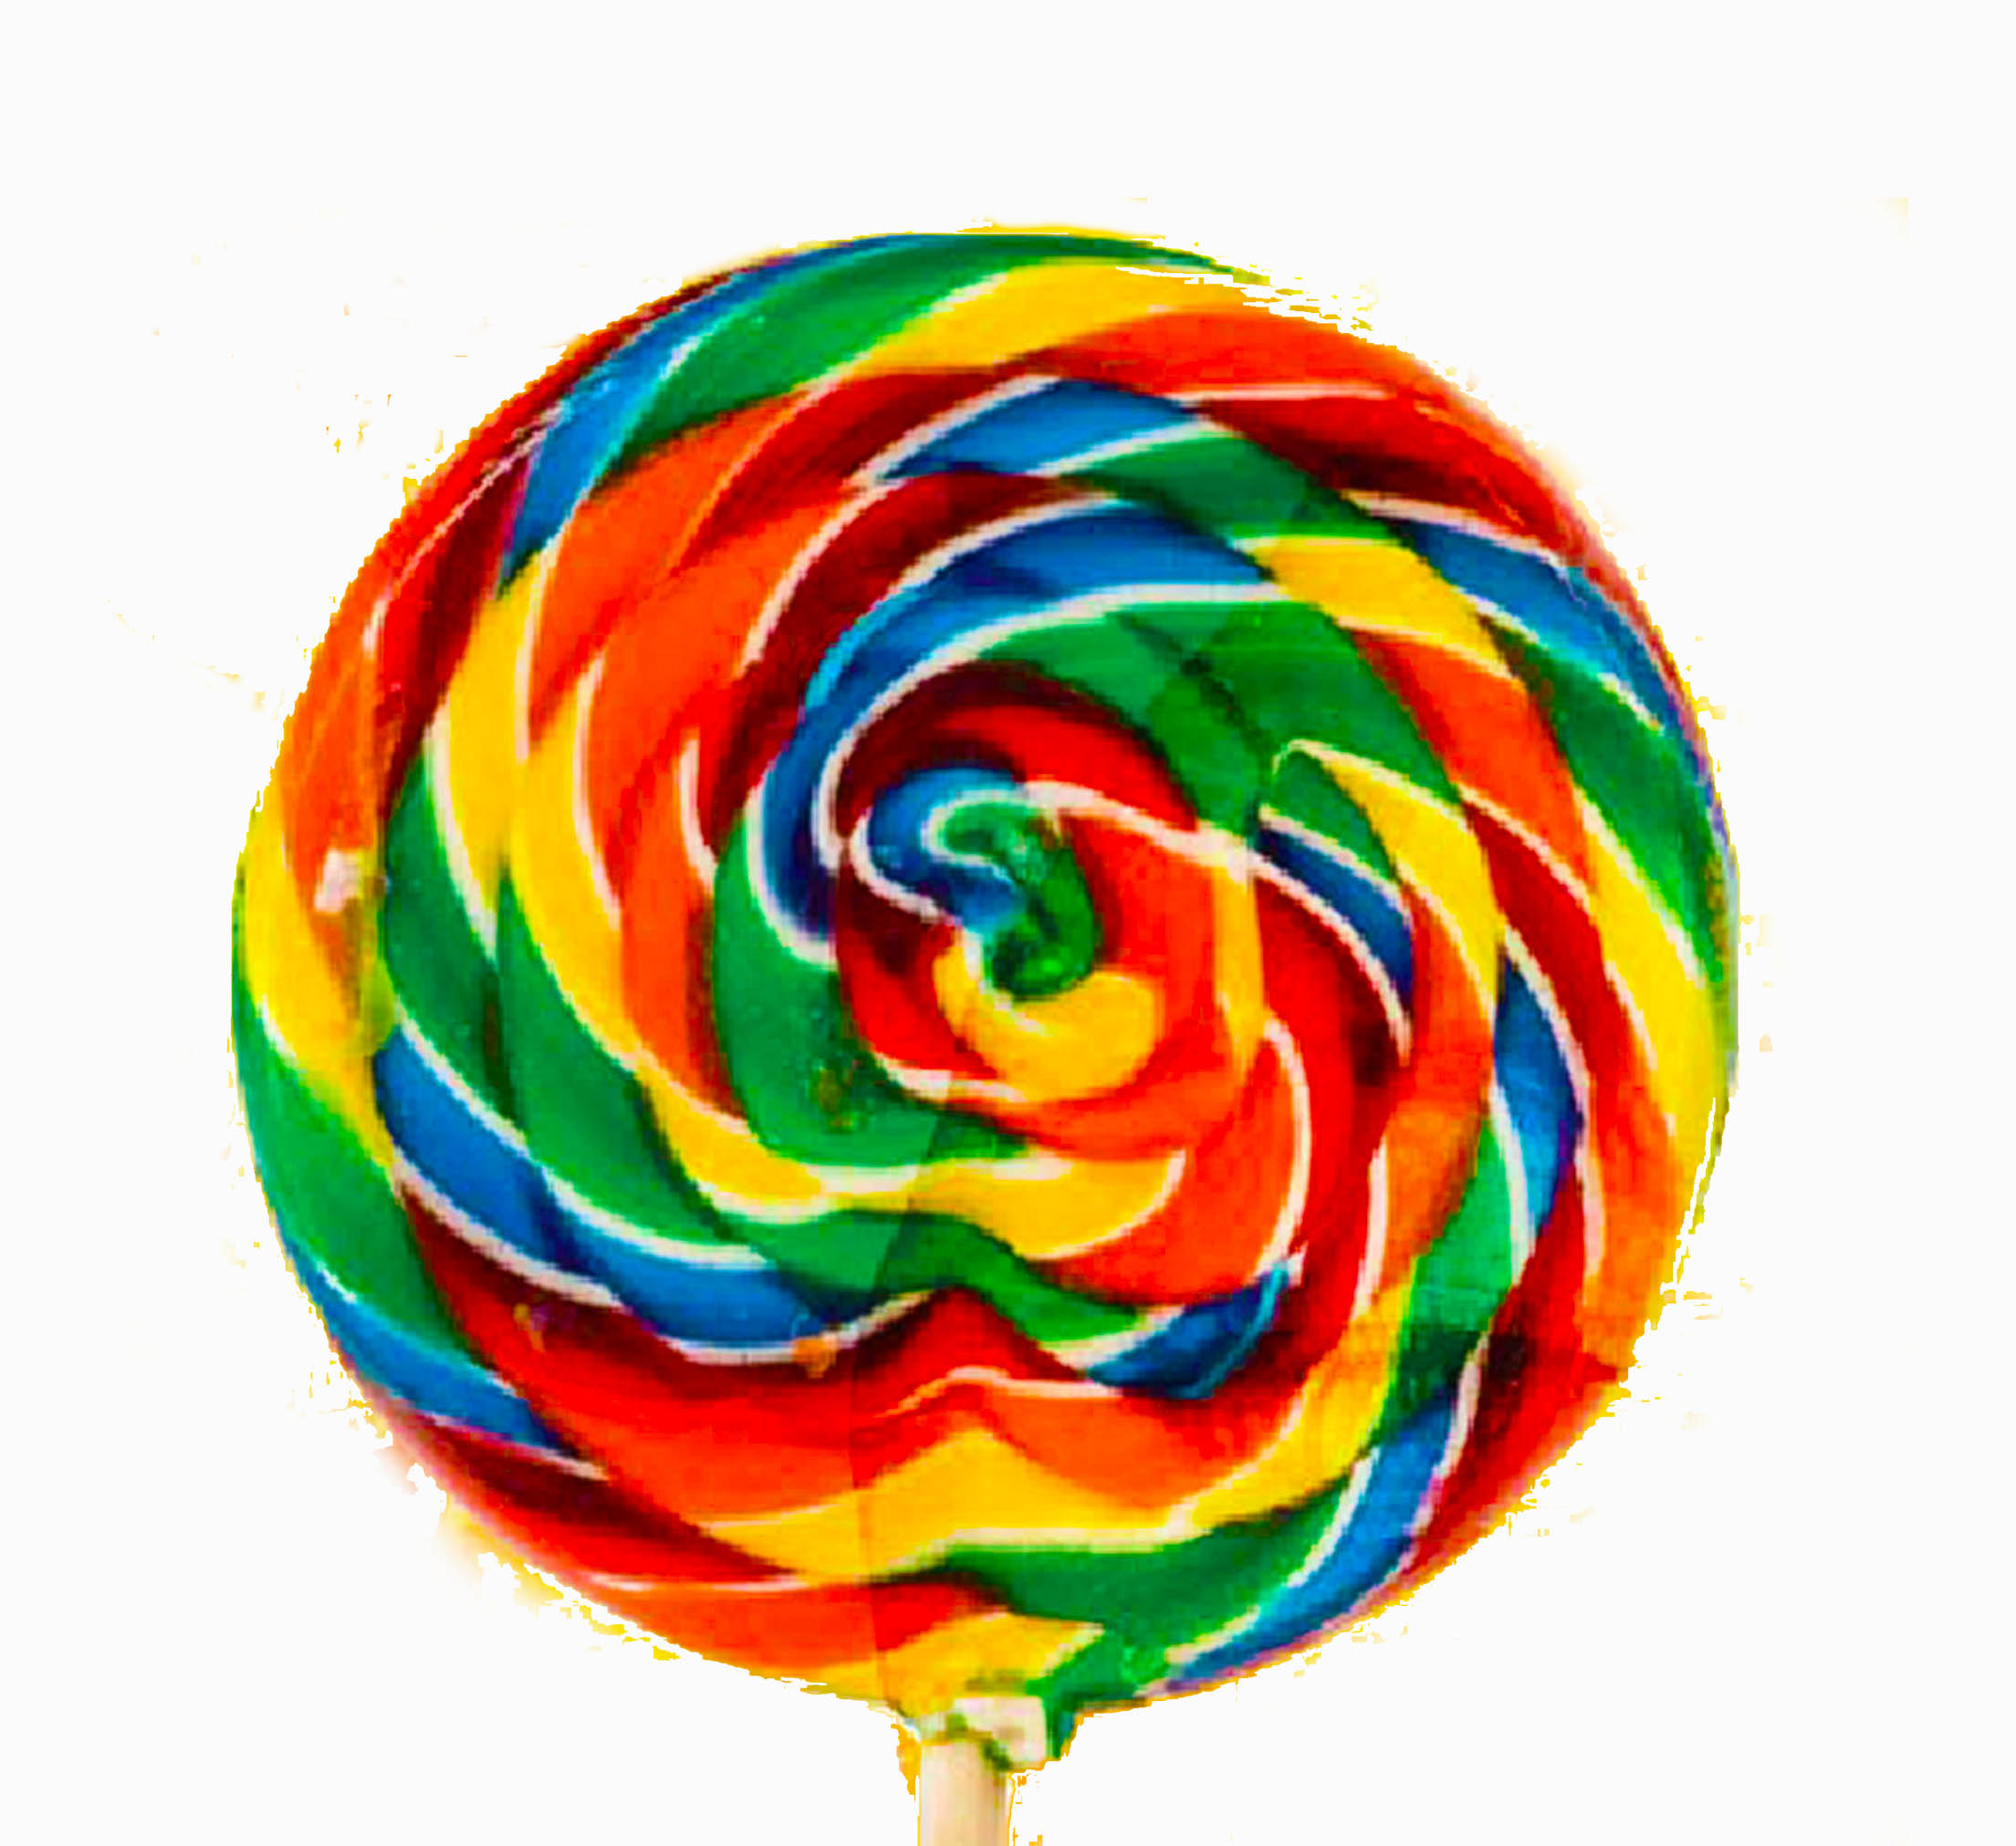 Rainbow Swirl Lollipop Clip Art N2 free image.